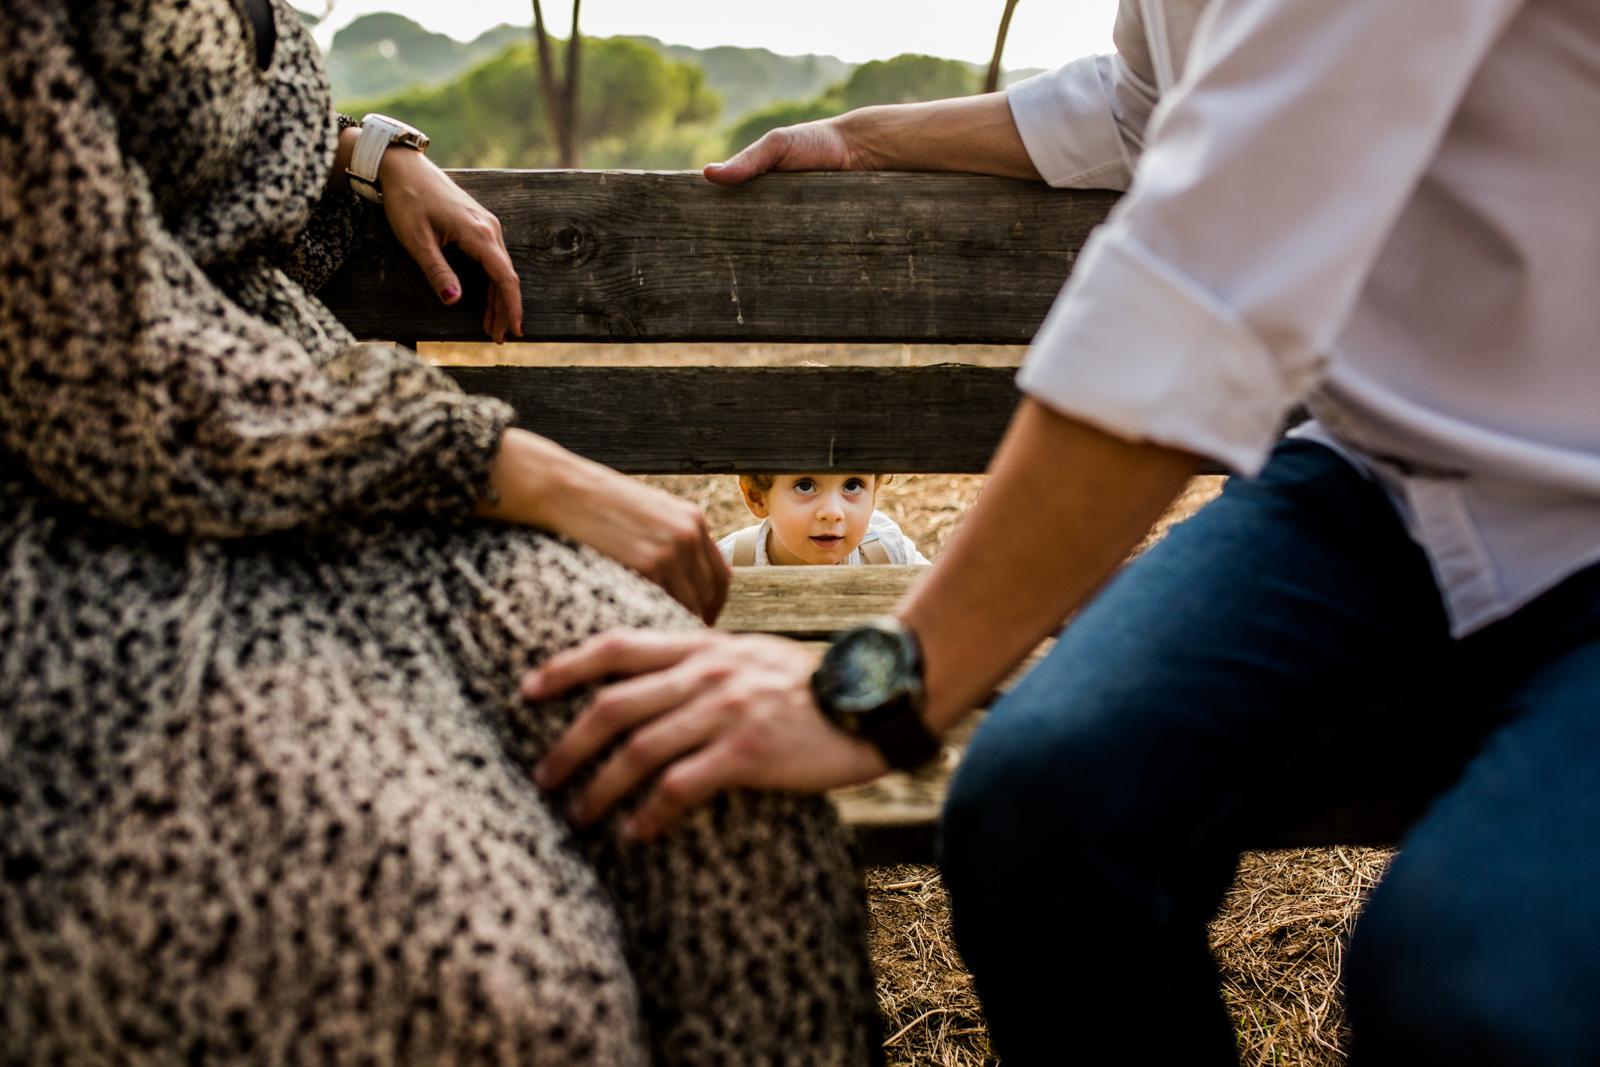 Wedroads-Boda-Sevilla-Parador-Carmona-bridal-engagement-Rafael-Torres-fotografo-bodas-sevilla-madrid-barcelona-wedding-photographer--1.jpg